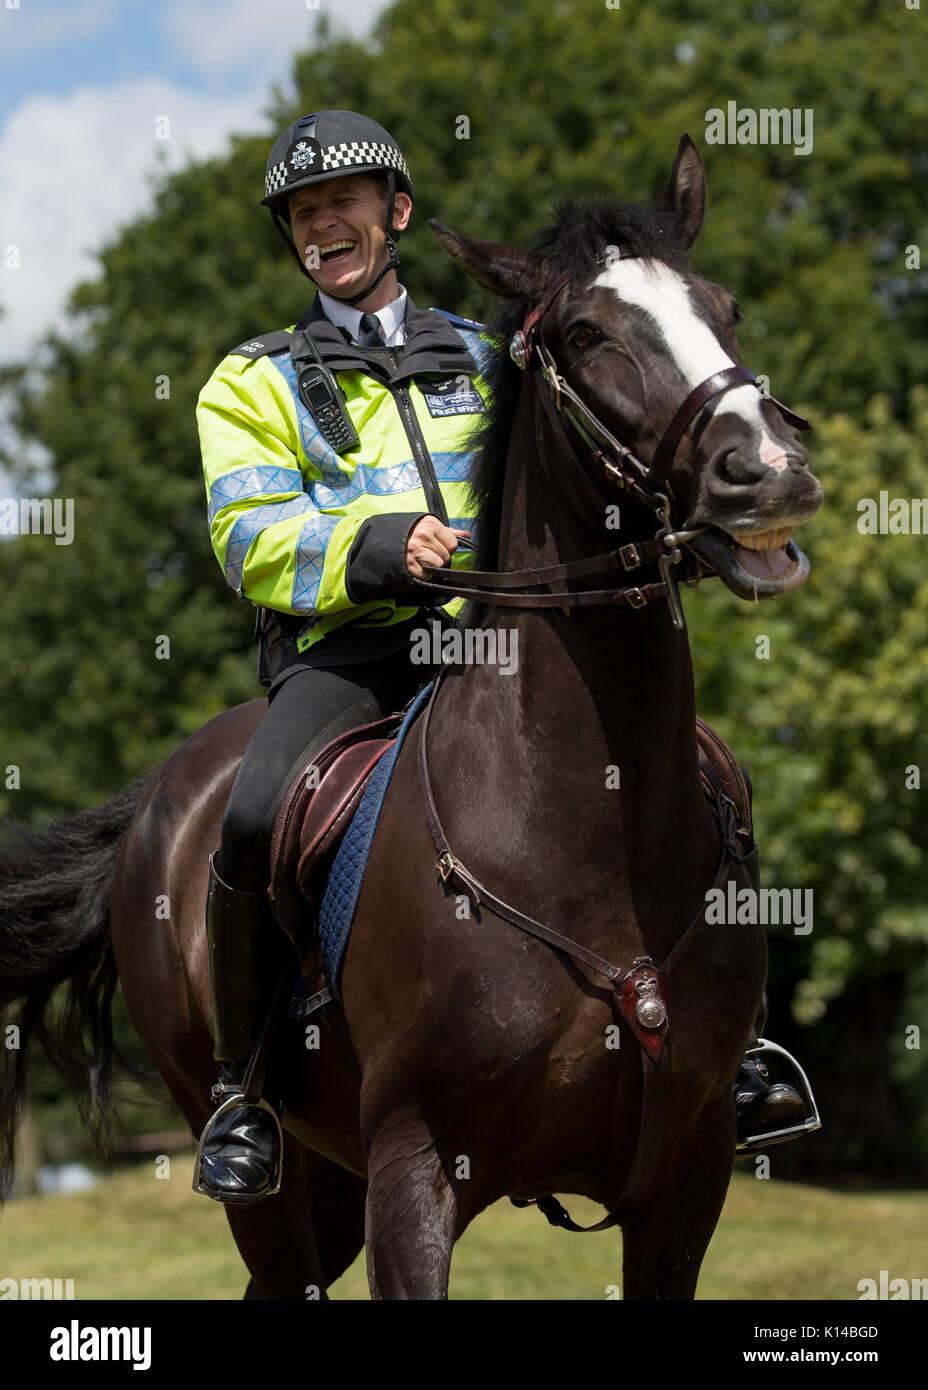 Horse mounted police outside Wimbledon Championships - Stock Image